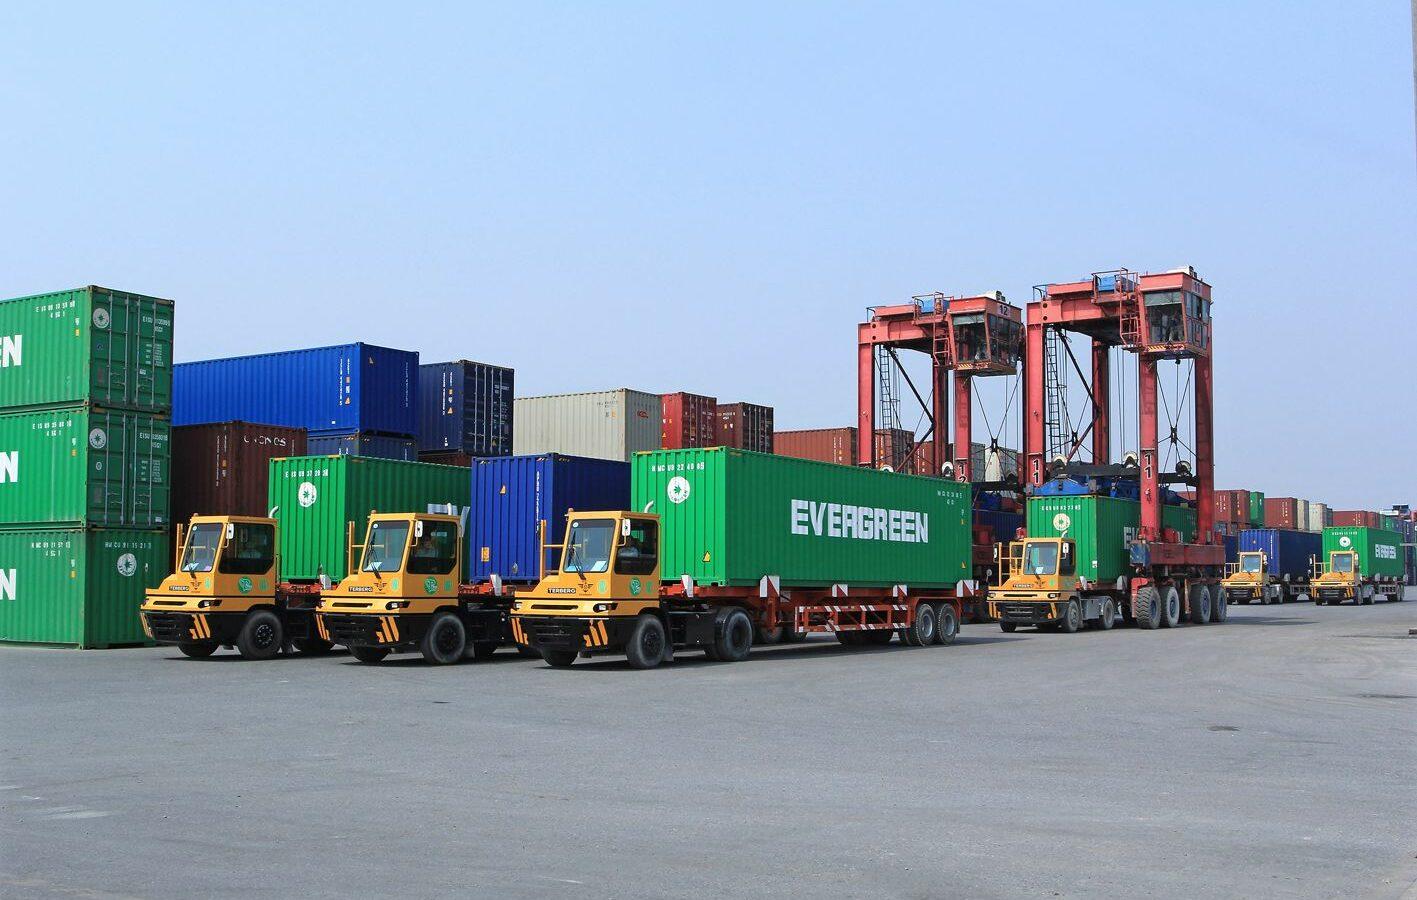 Vietnam maritime logistics